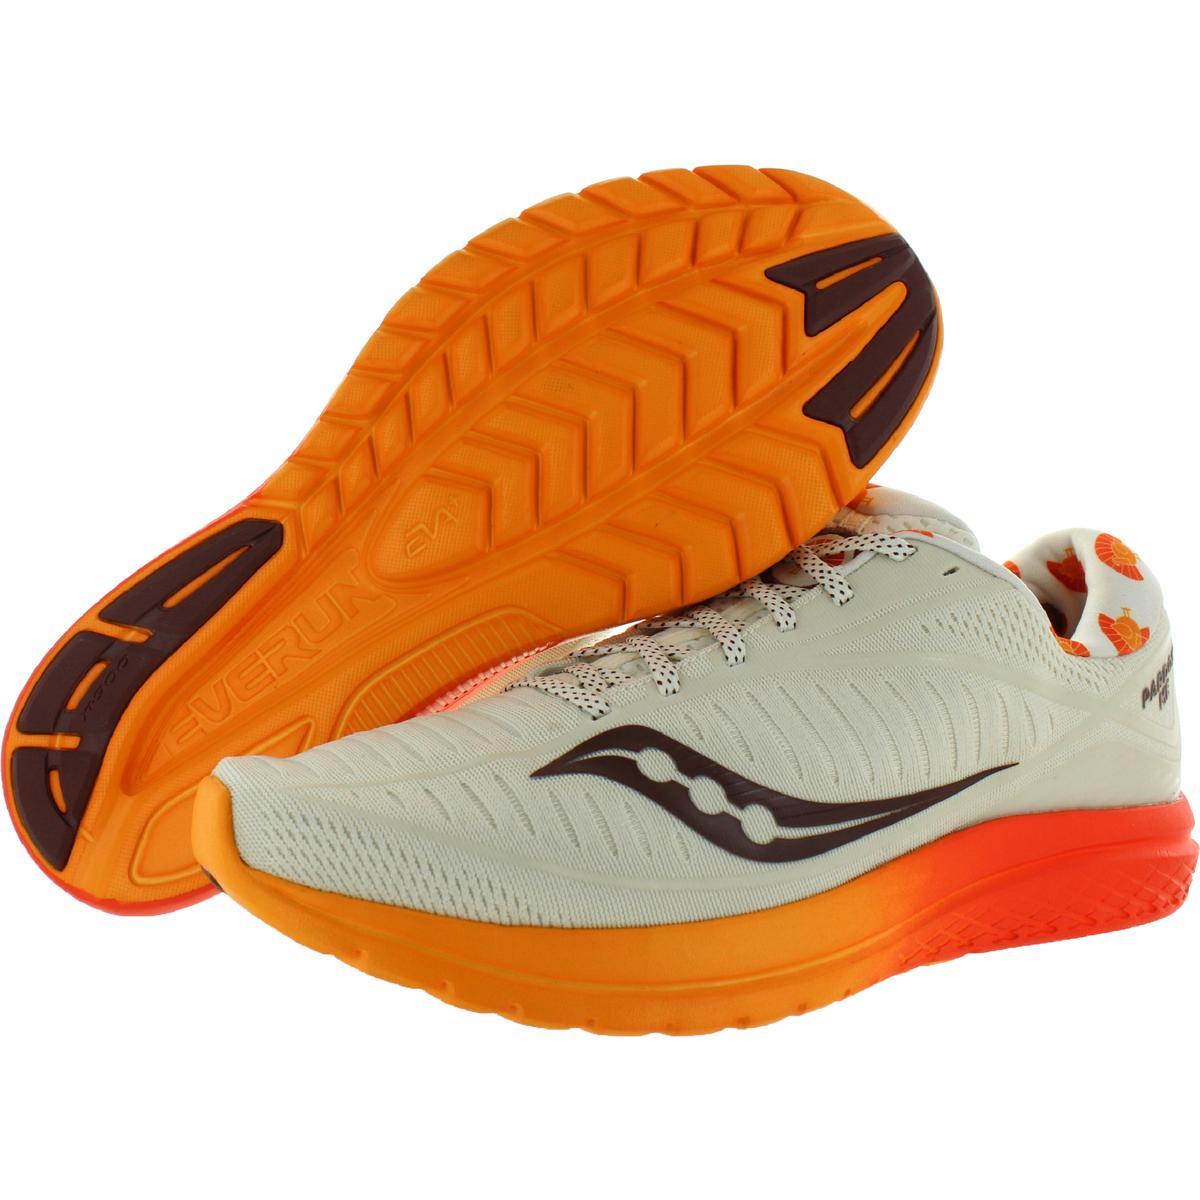 Saucony-Herren-Kinvara-10-Comfort-Running-Turnschuhe-Sneakers-Schuhe-bhfo-3377 Indexbild 10